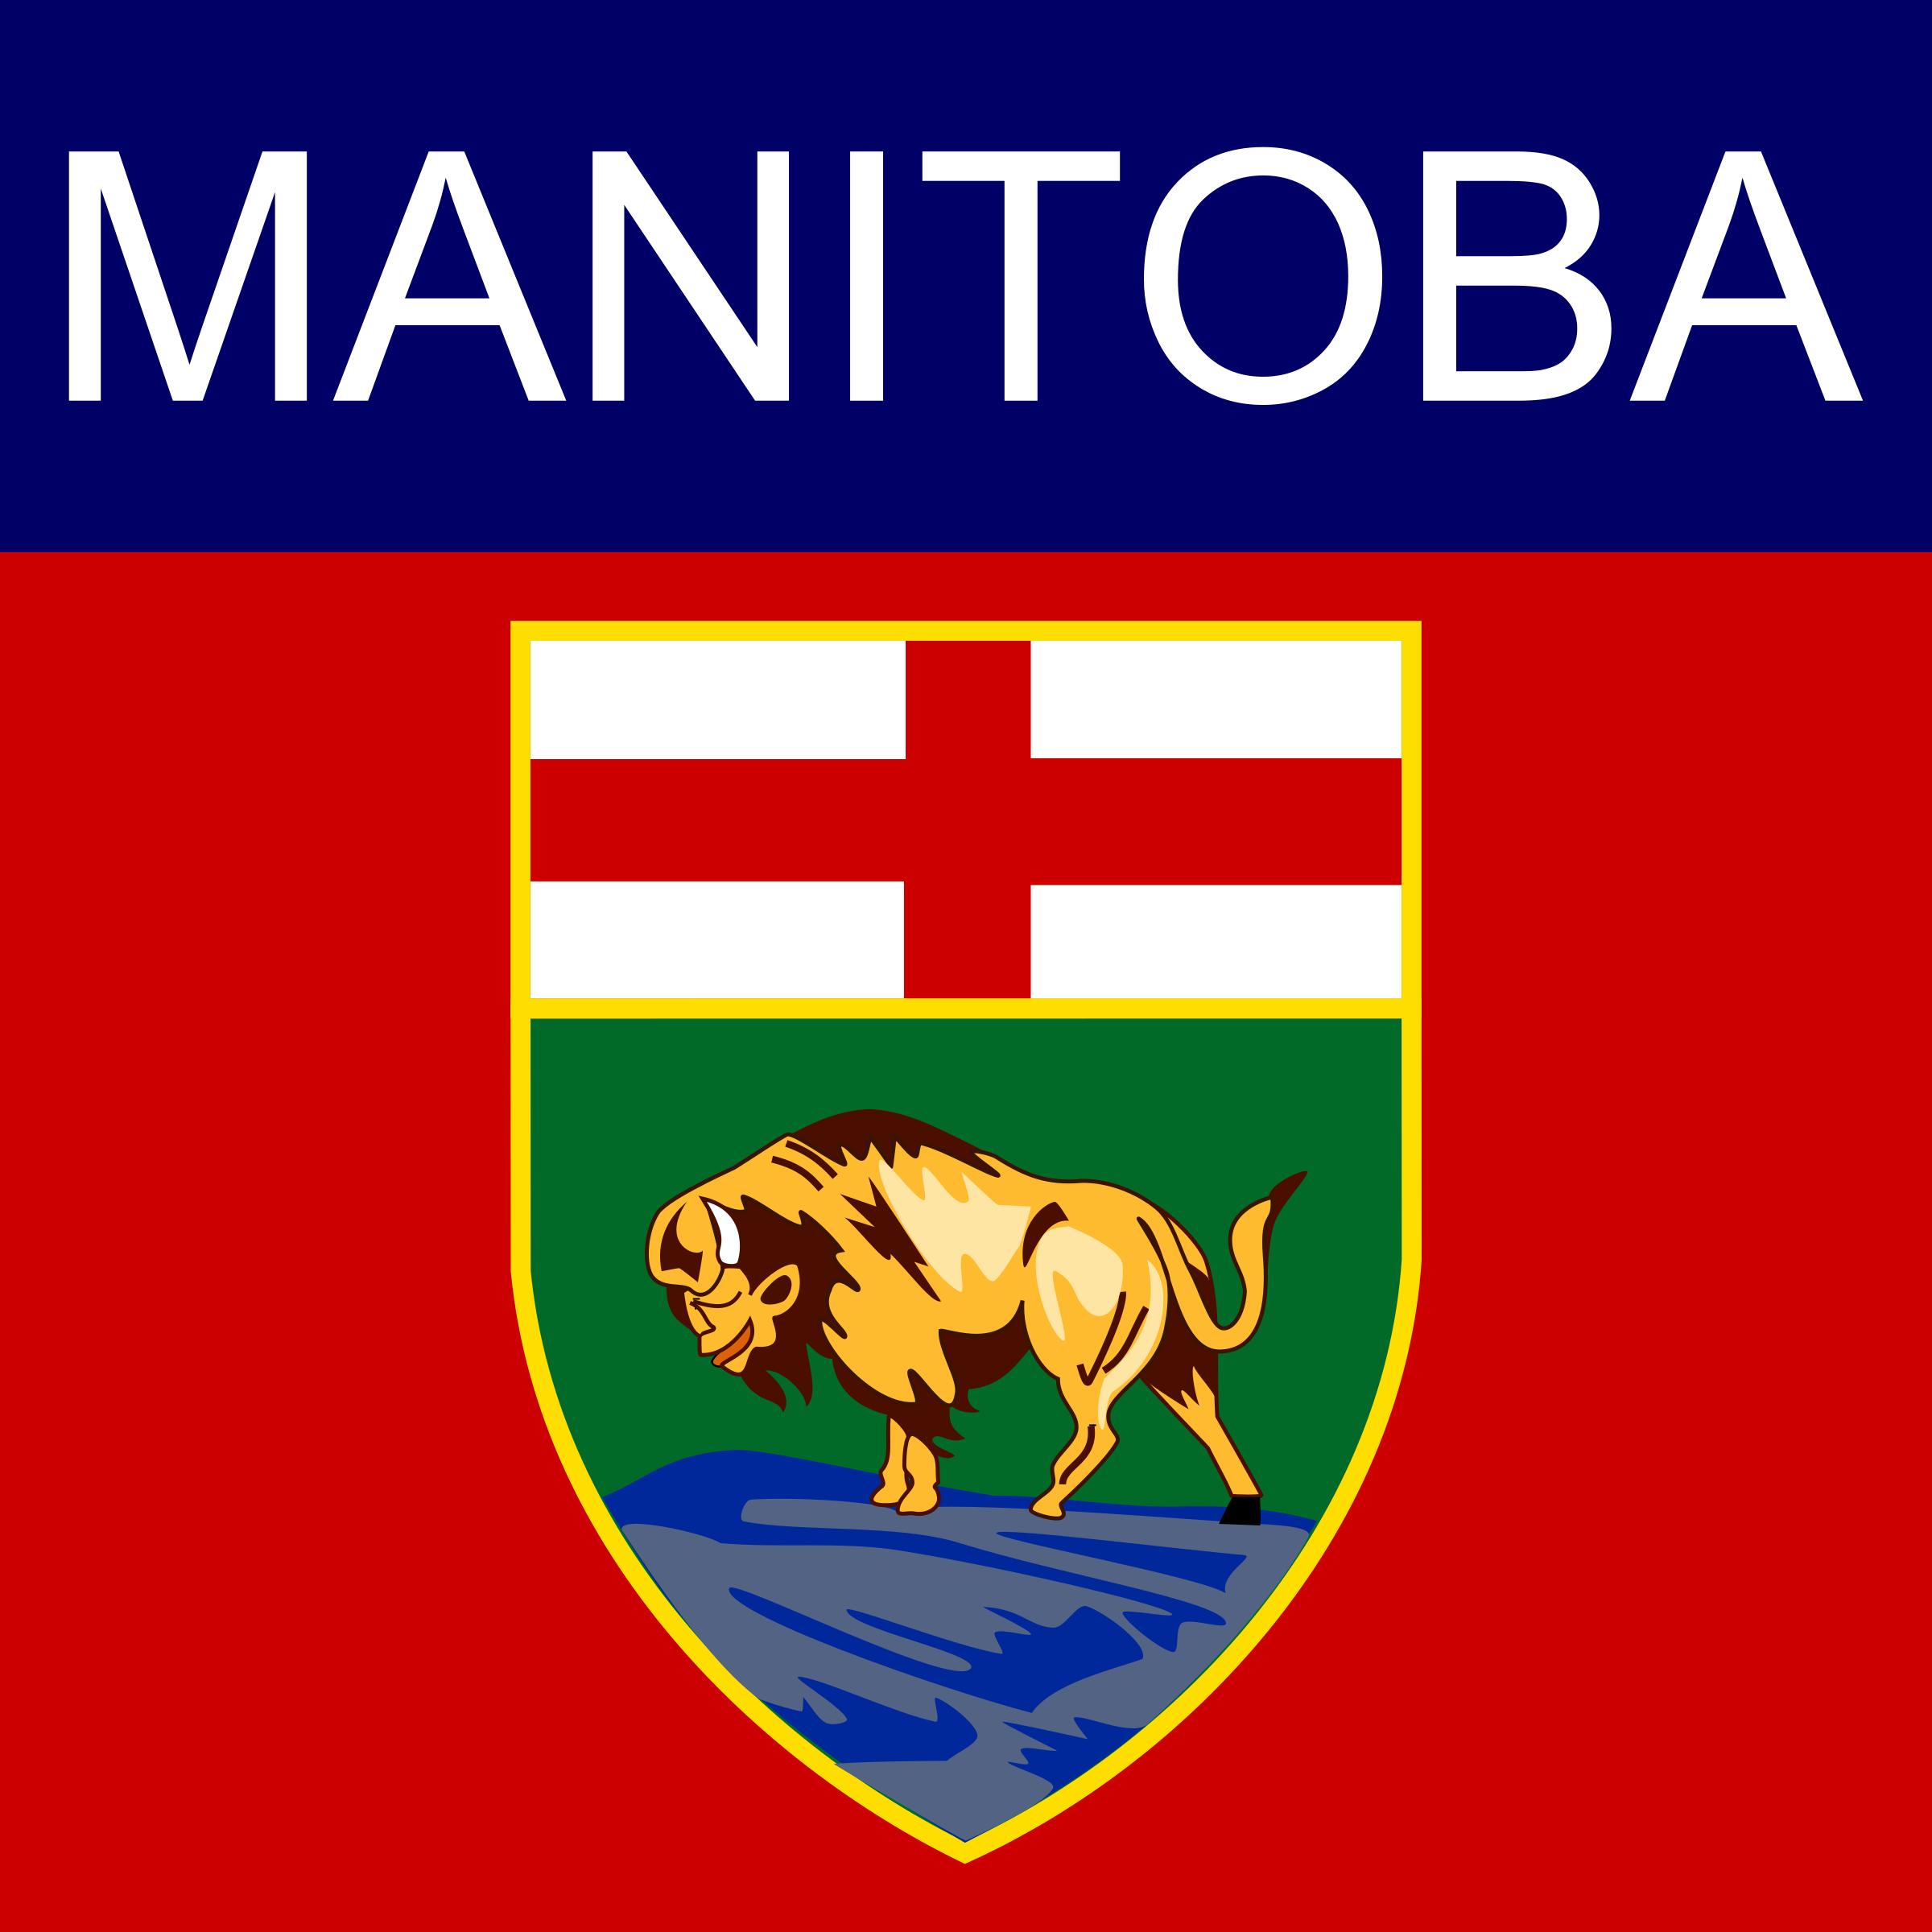 Manitoba clipart #4, Download drawings